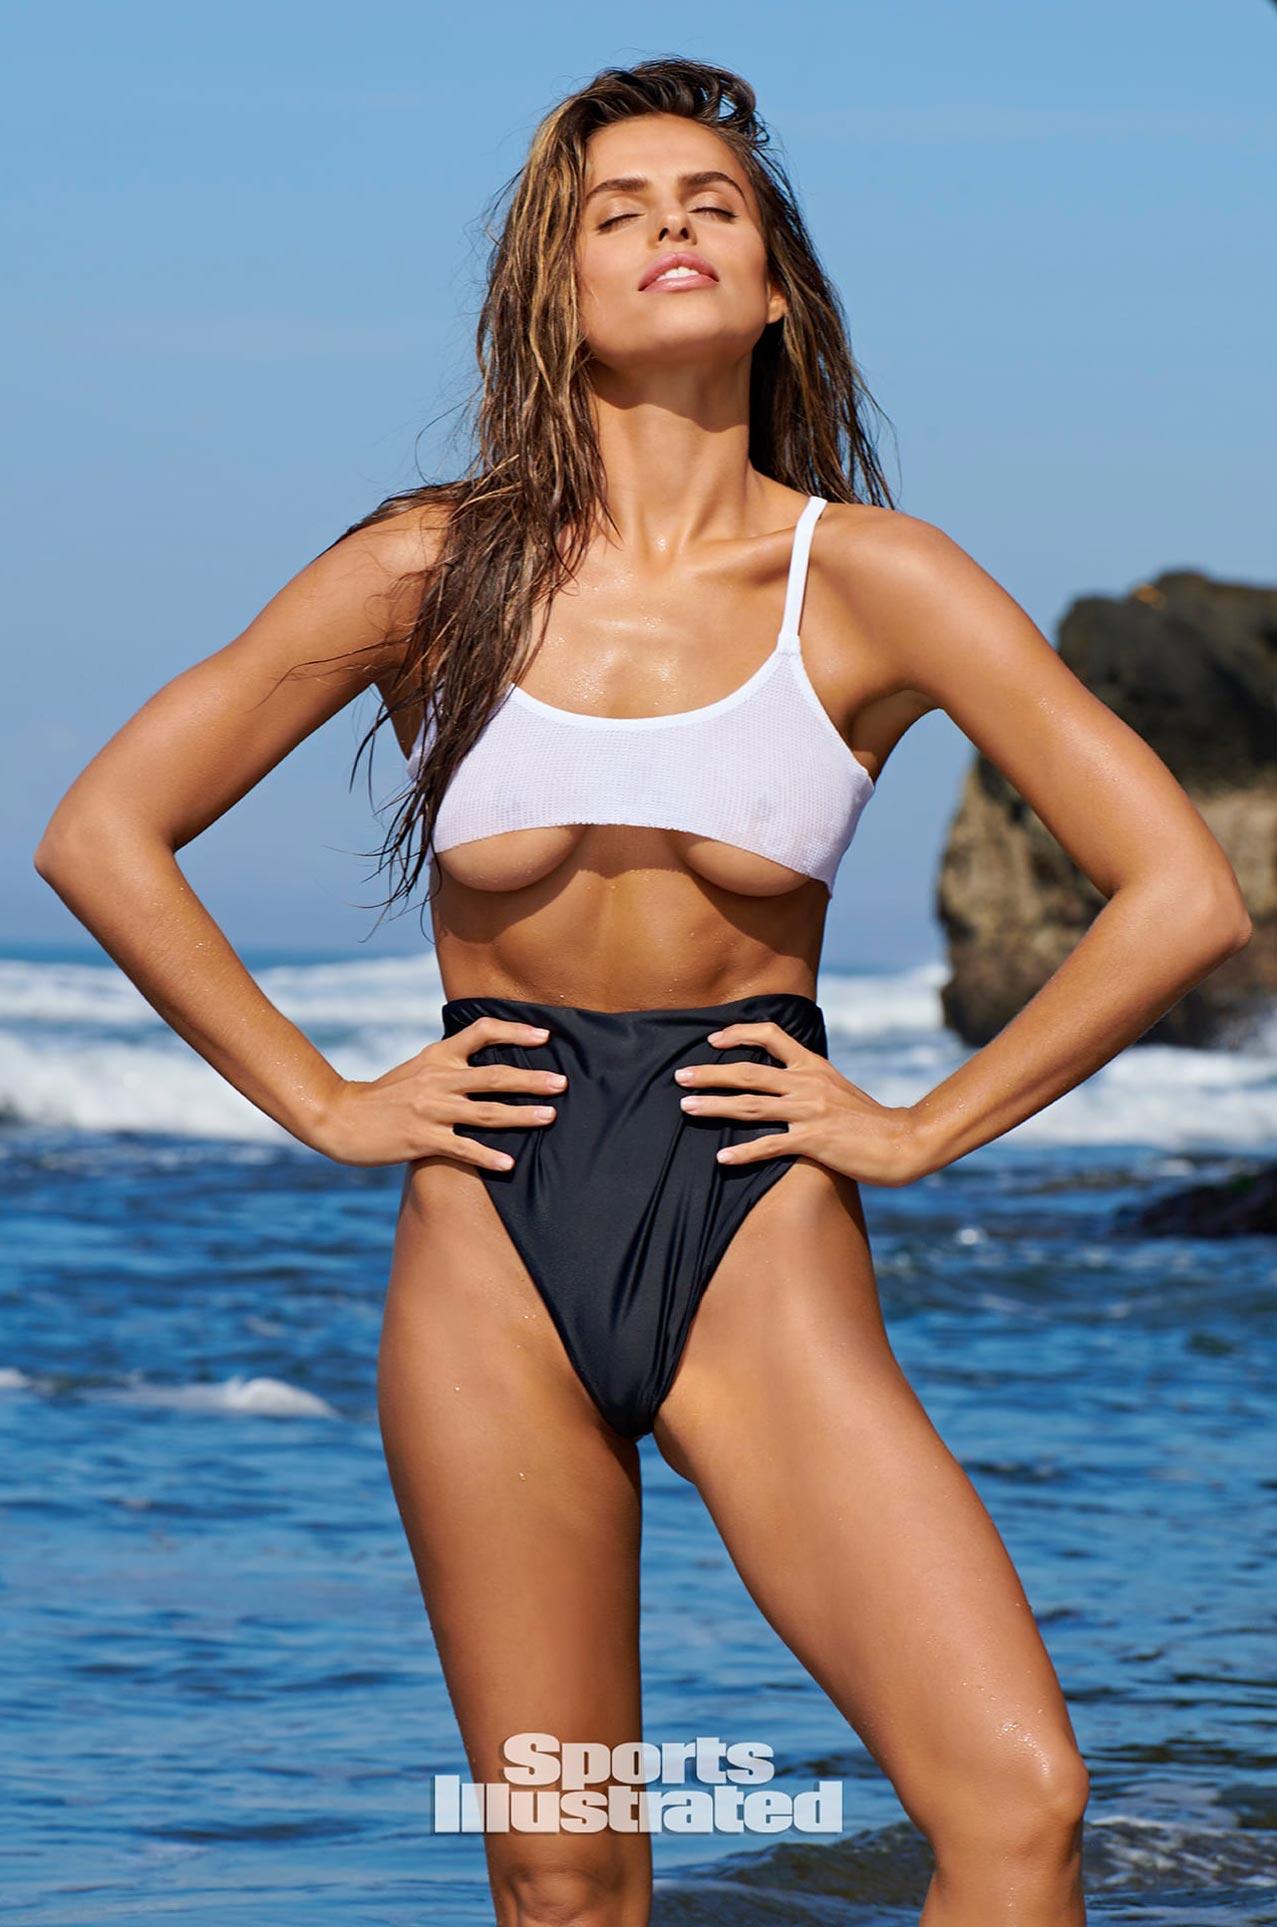 Брукс Надер в каталоге купальников Sports Illustrated Swimsuit 2020 / фото 20